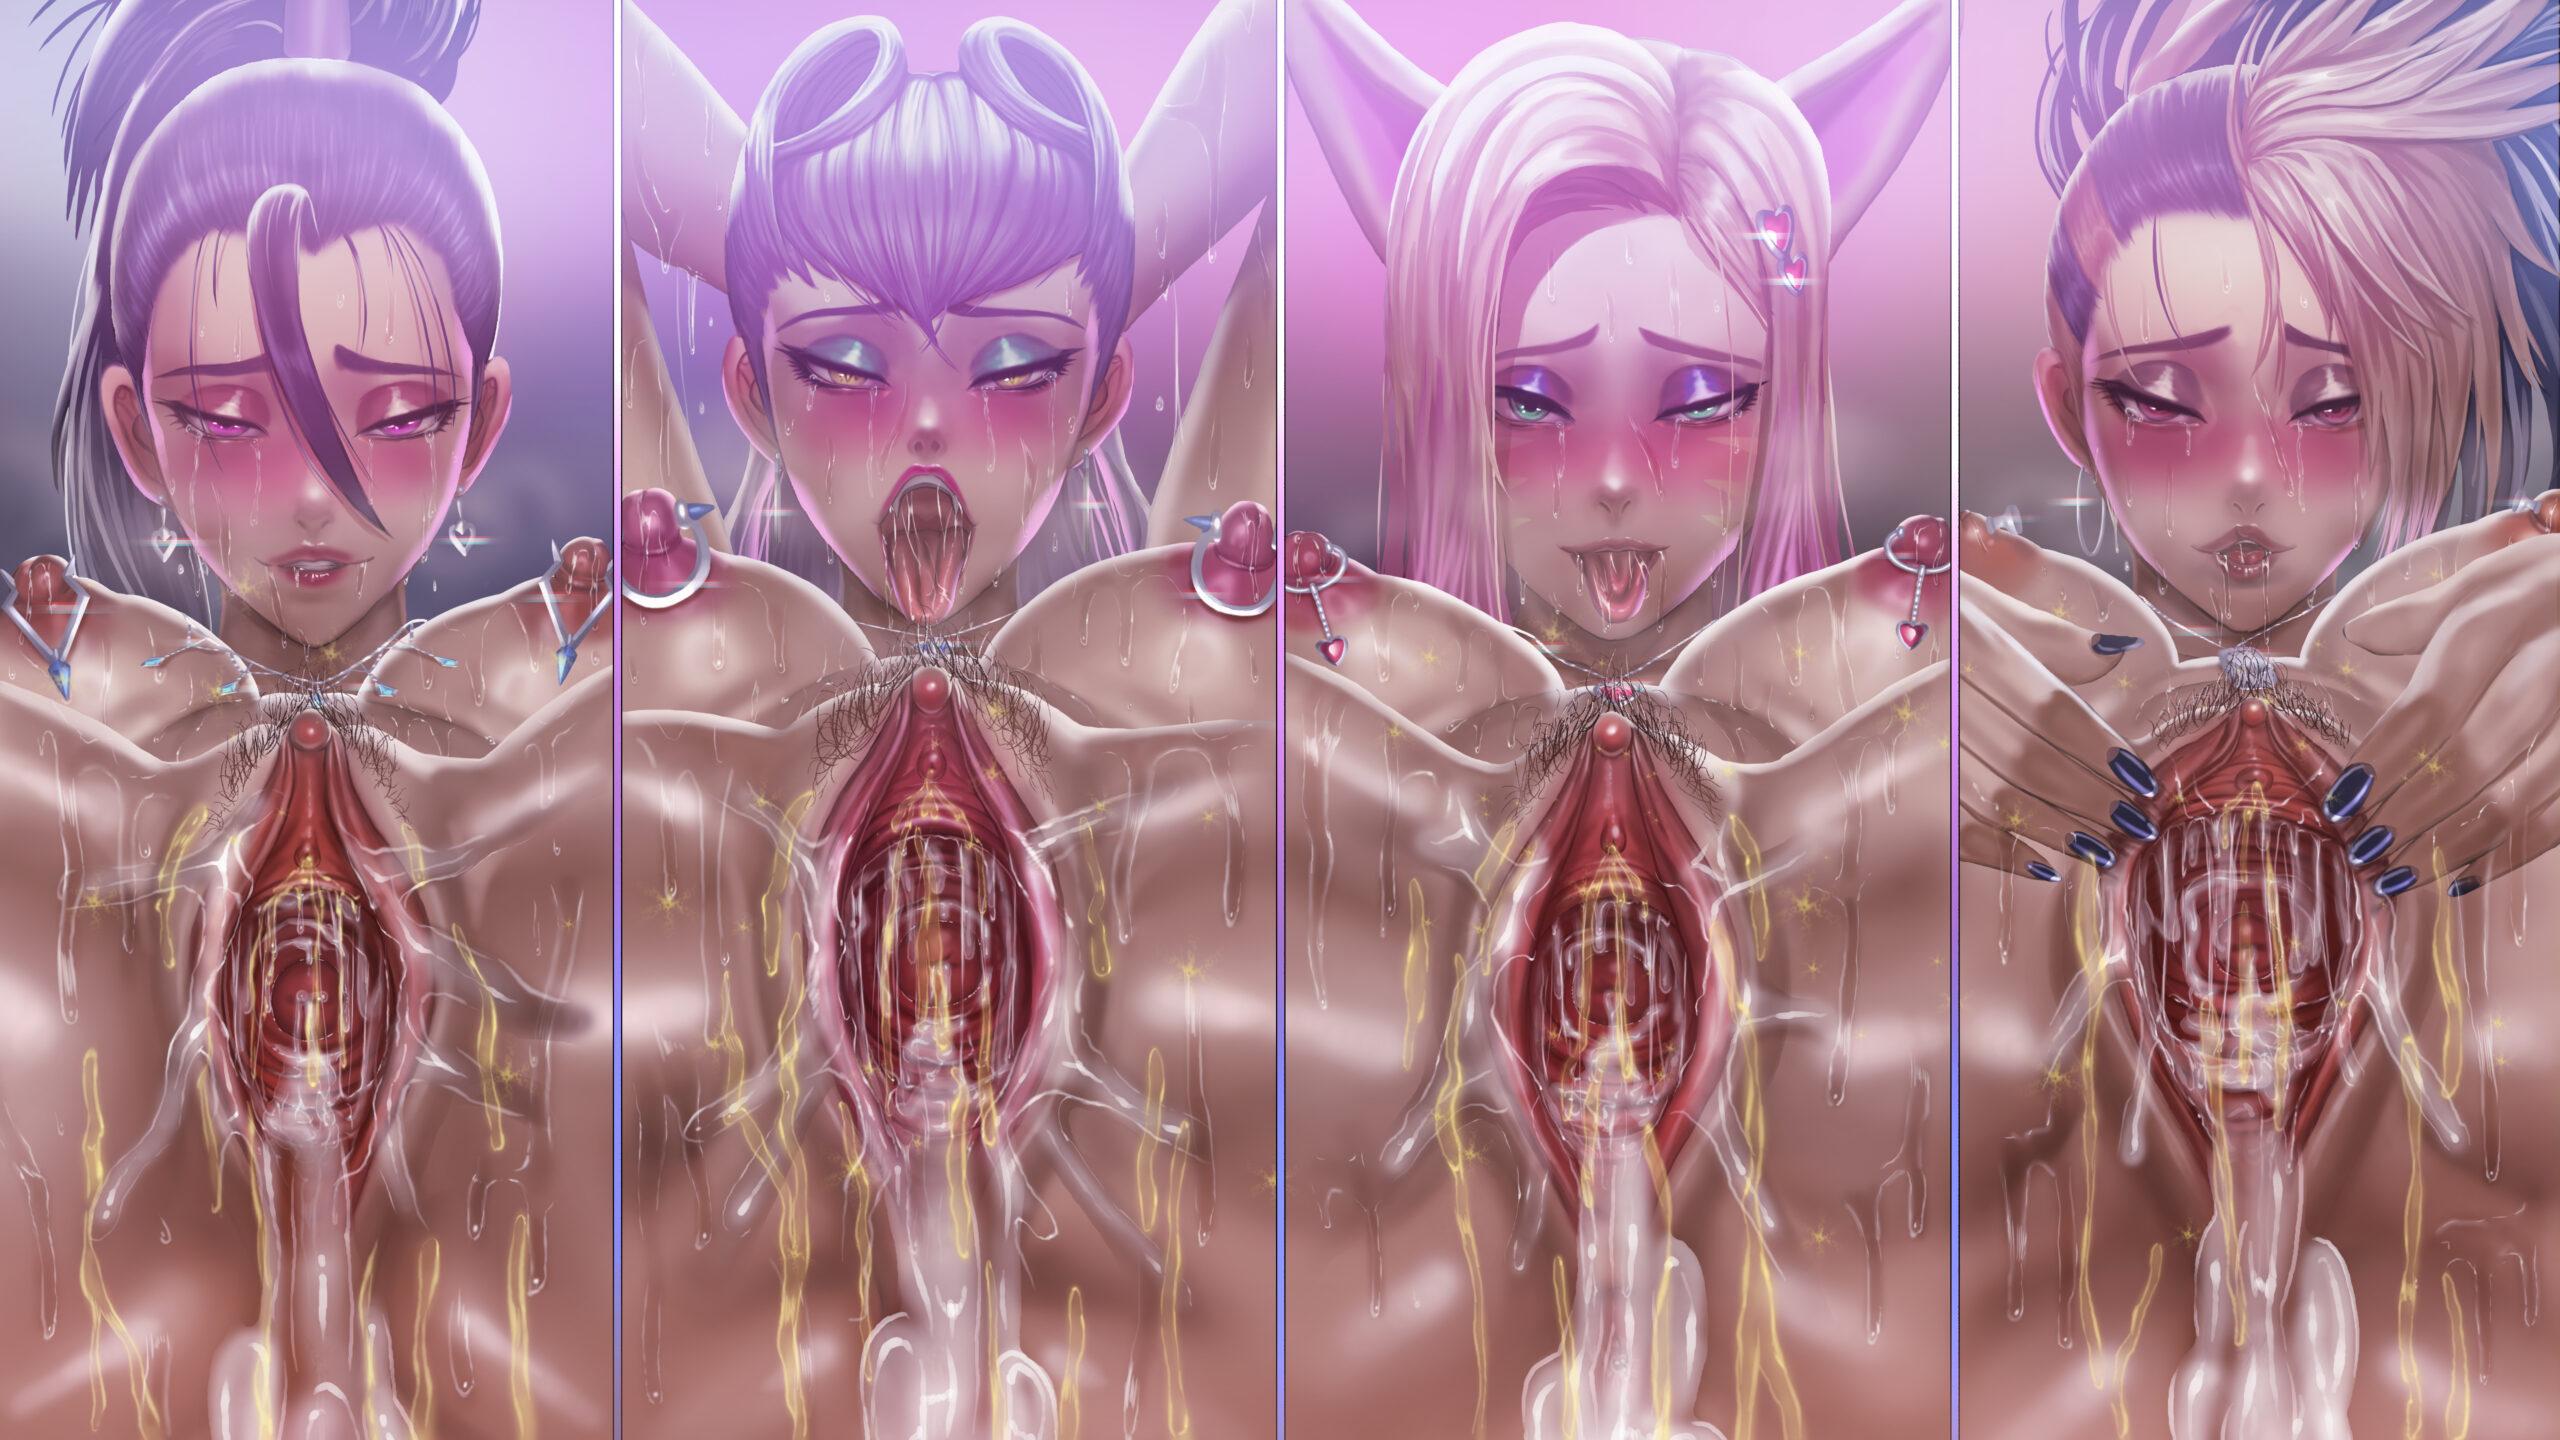 [ENG - ARTIST CG] Roke ~ KDA Limited Edition Hentai